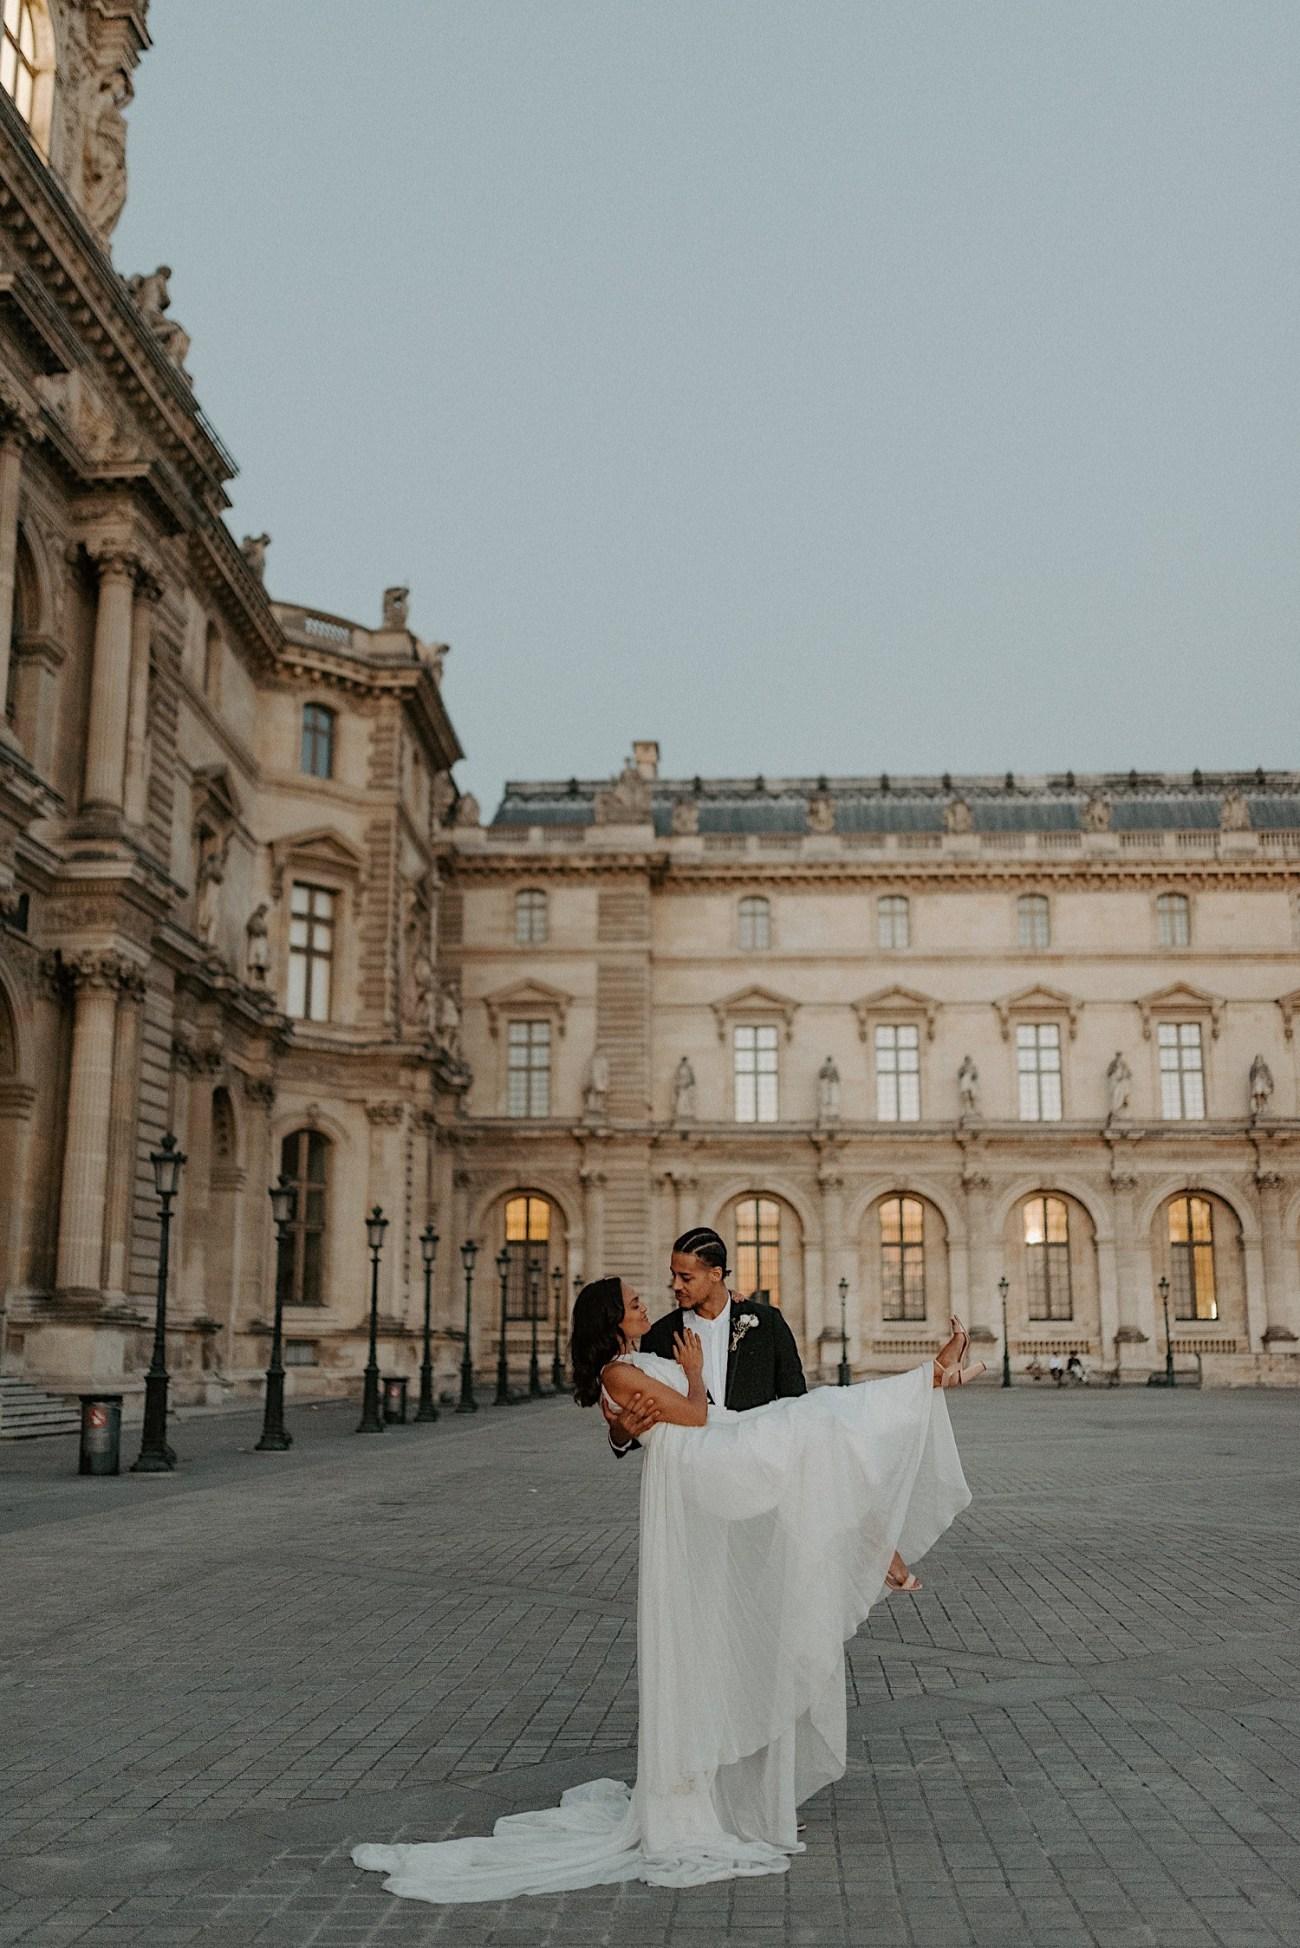 Paris Louvre Wedding Photos Paris Wedding Photographer Destination Wedding France Anais Possamai Photography 29